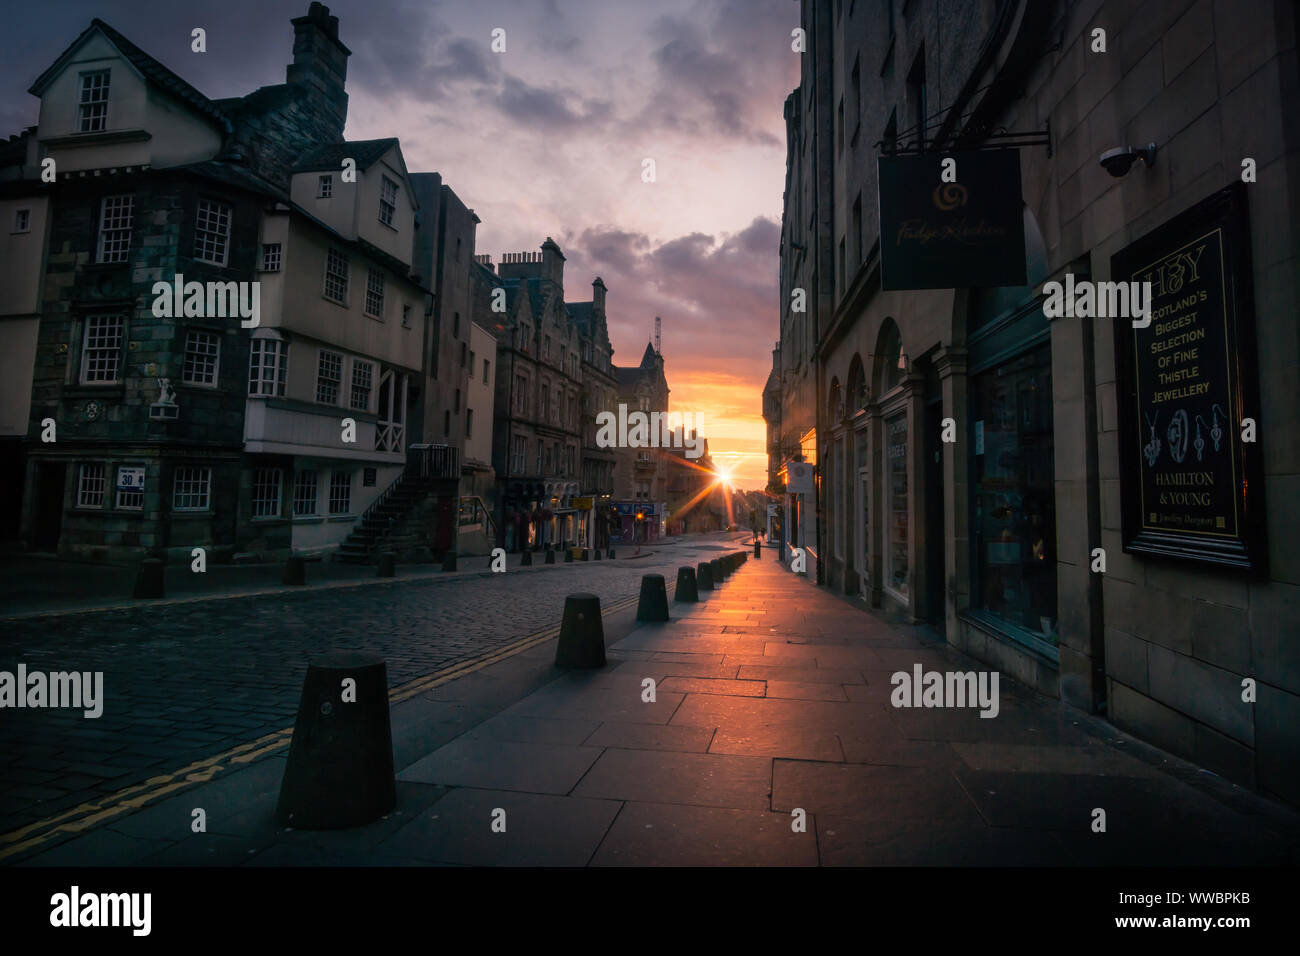 Sunrise on the Royal Mile, Edinburgh, Scotland. Stock Photo